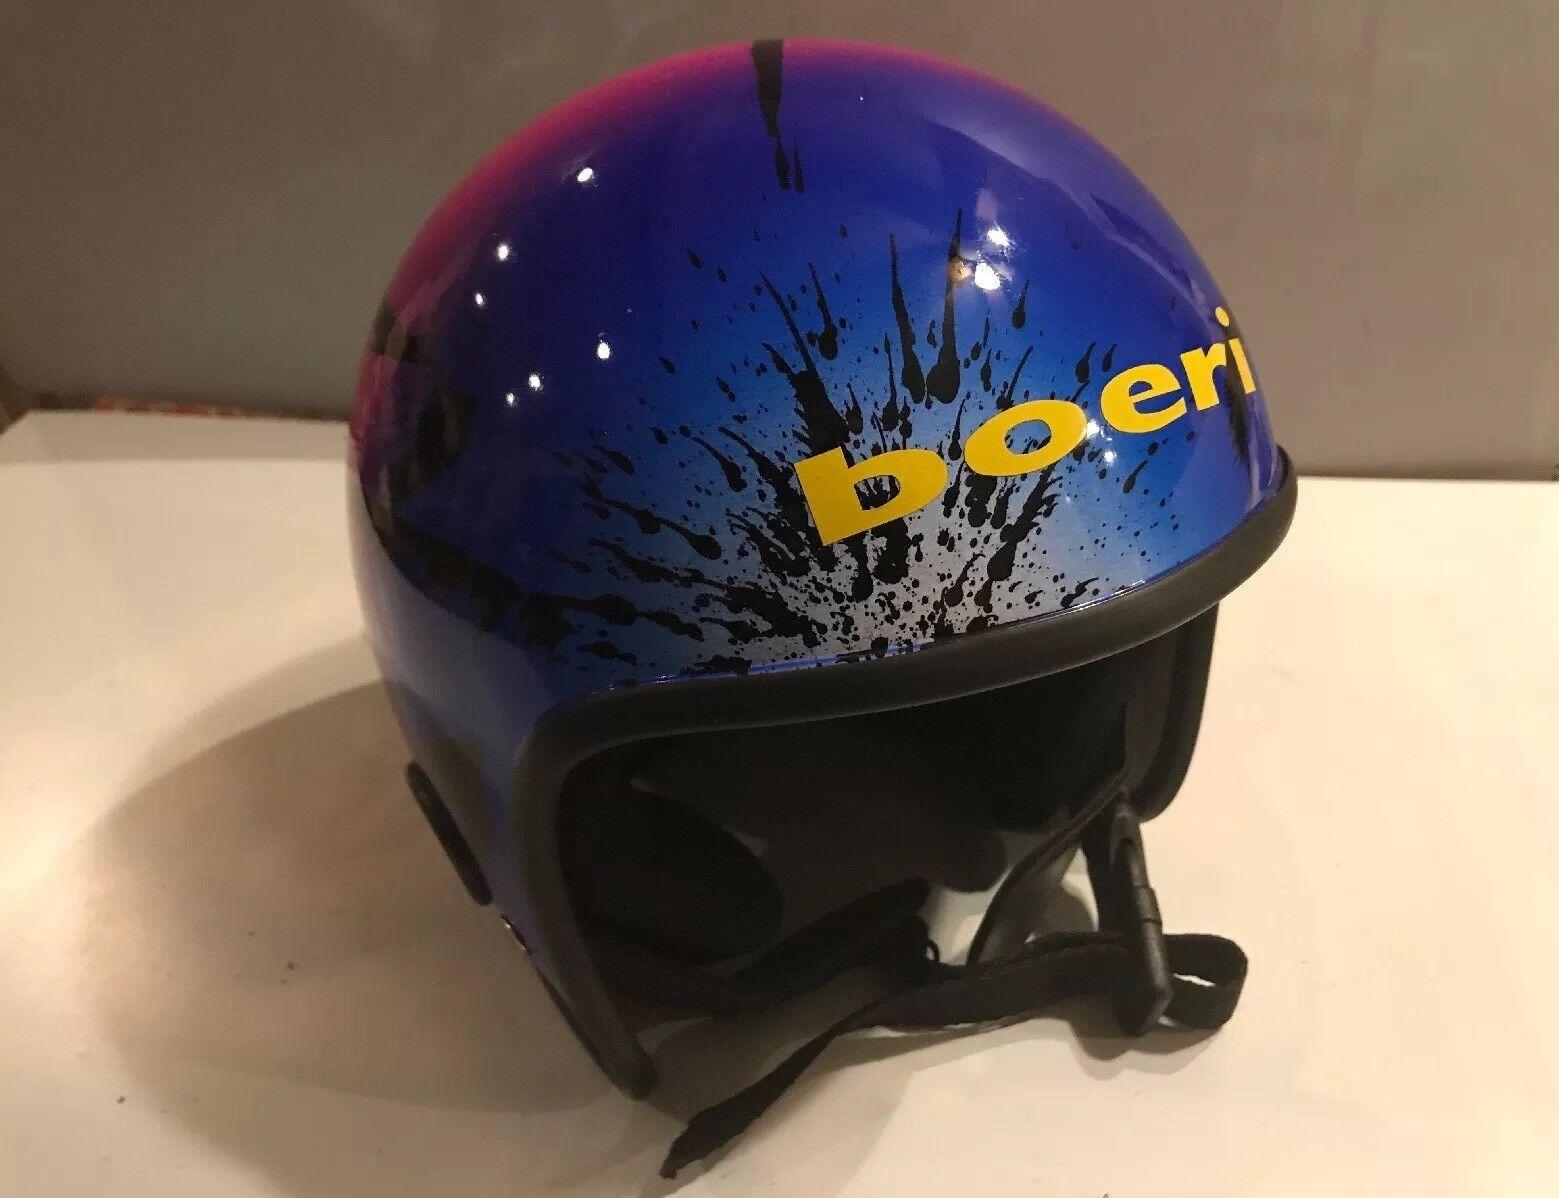 BOERI Snowboard Ski Helmet  ld  M Sprint Confetti Paint Splatter NOS Ships Free  60% off